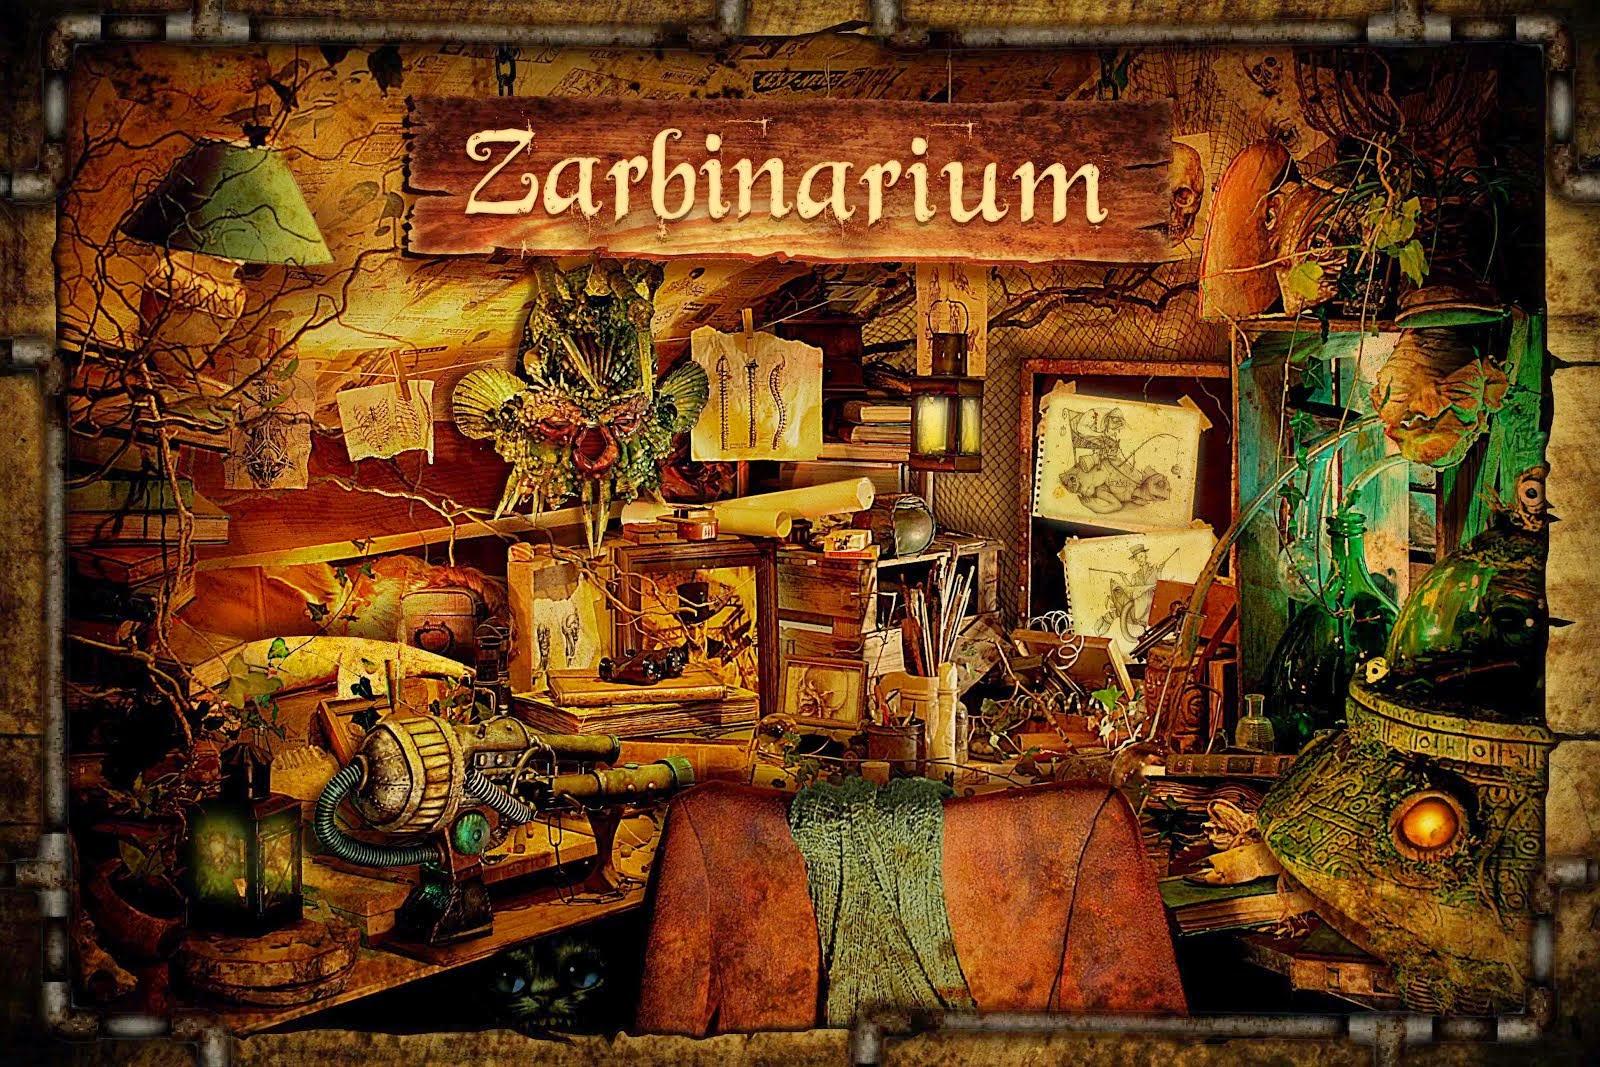 Zarbinarium